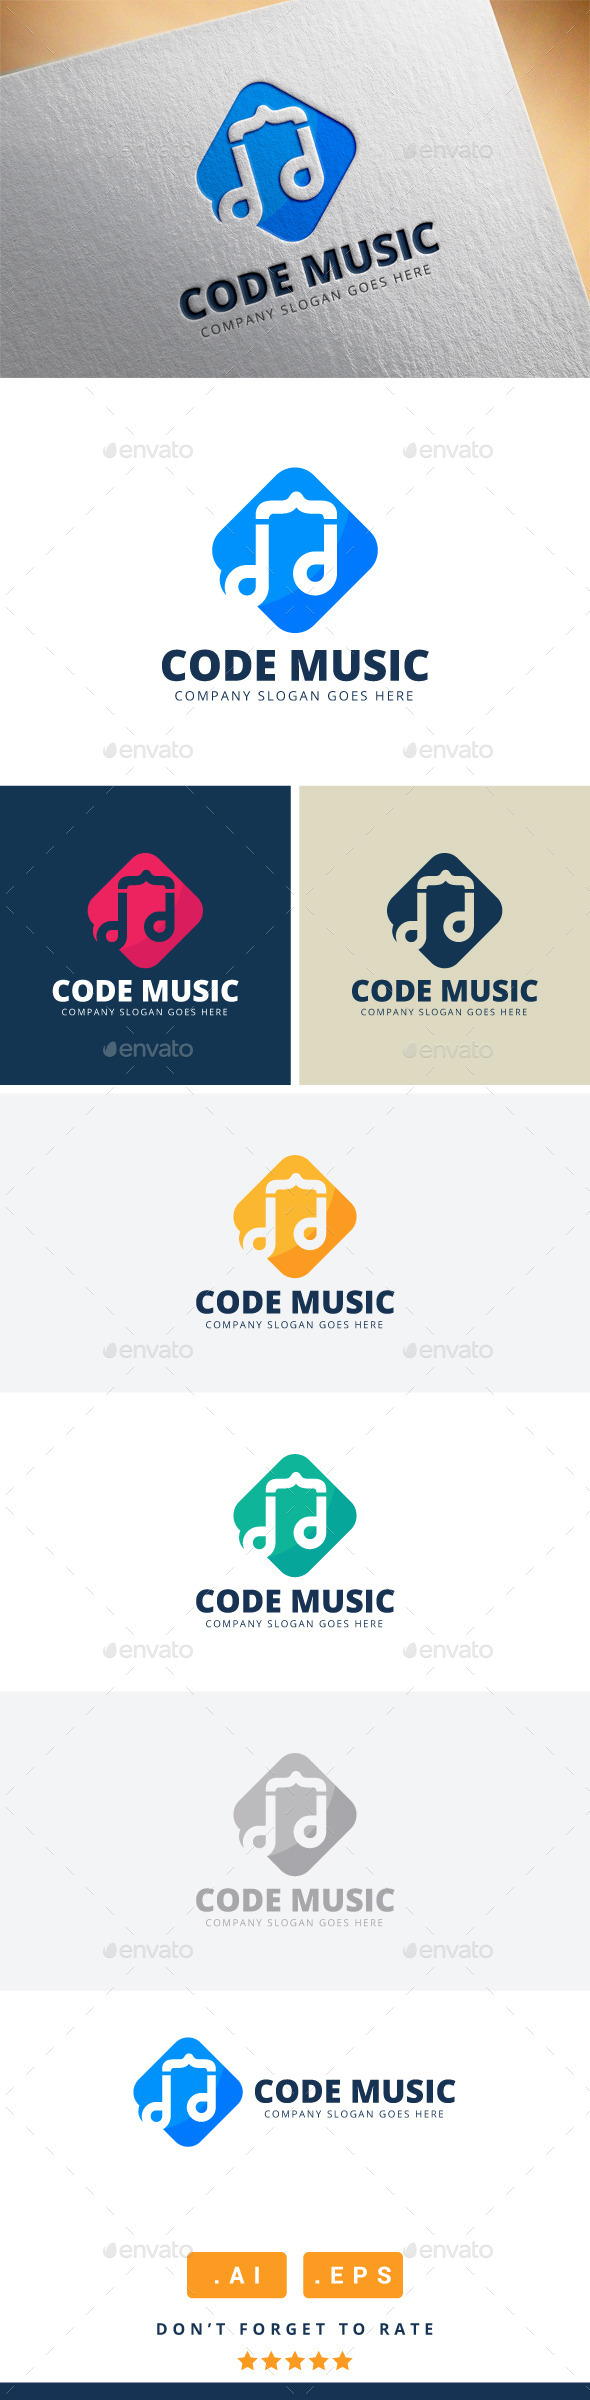 GraphicRiver Code Music Logo 11416466